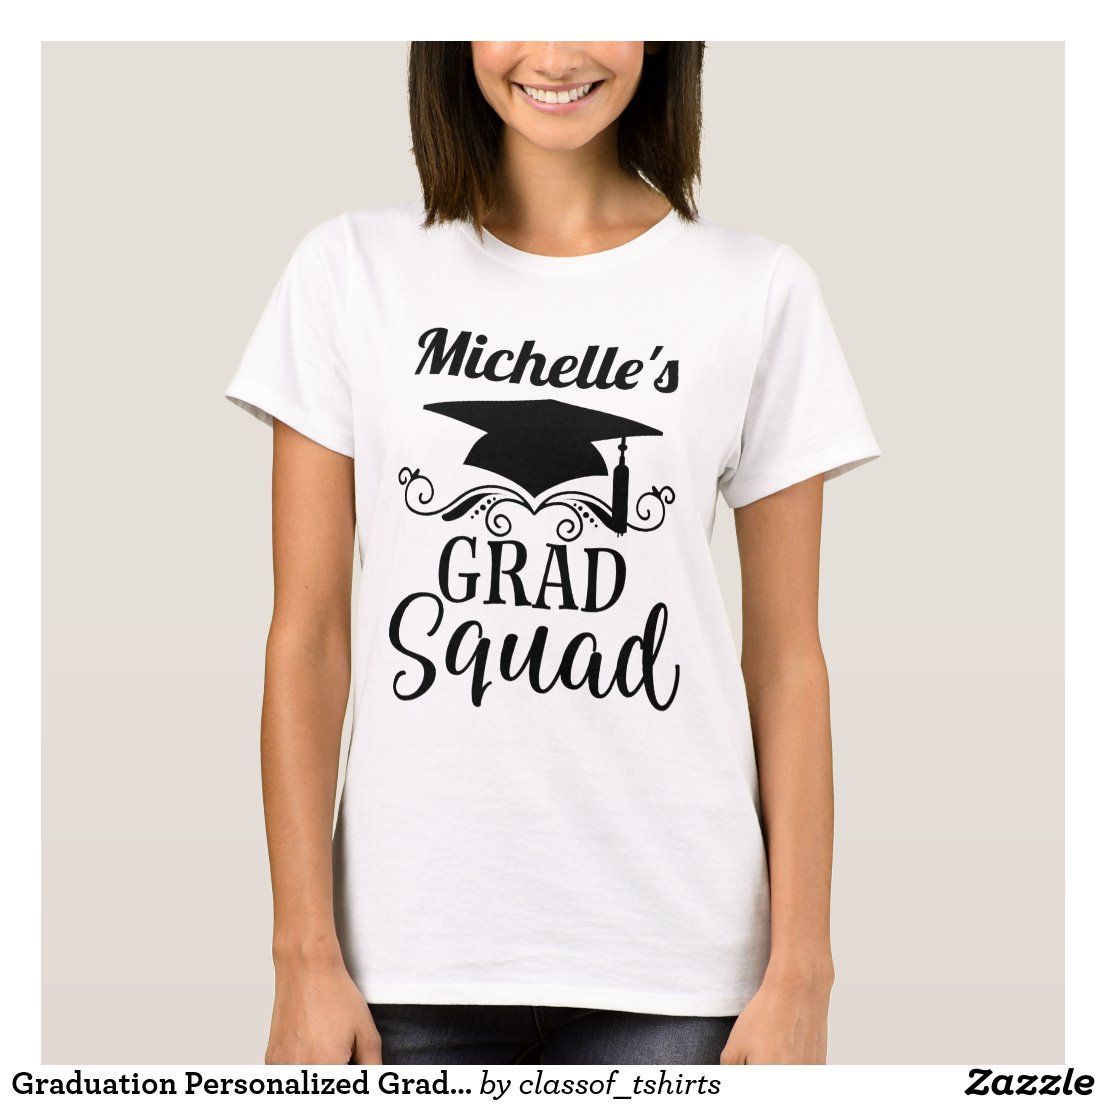 Graduation personalized grad squad tshirt in